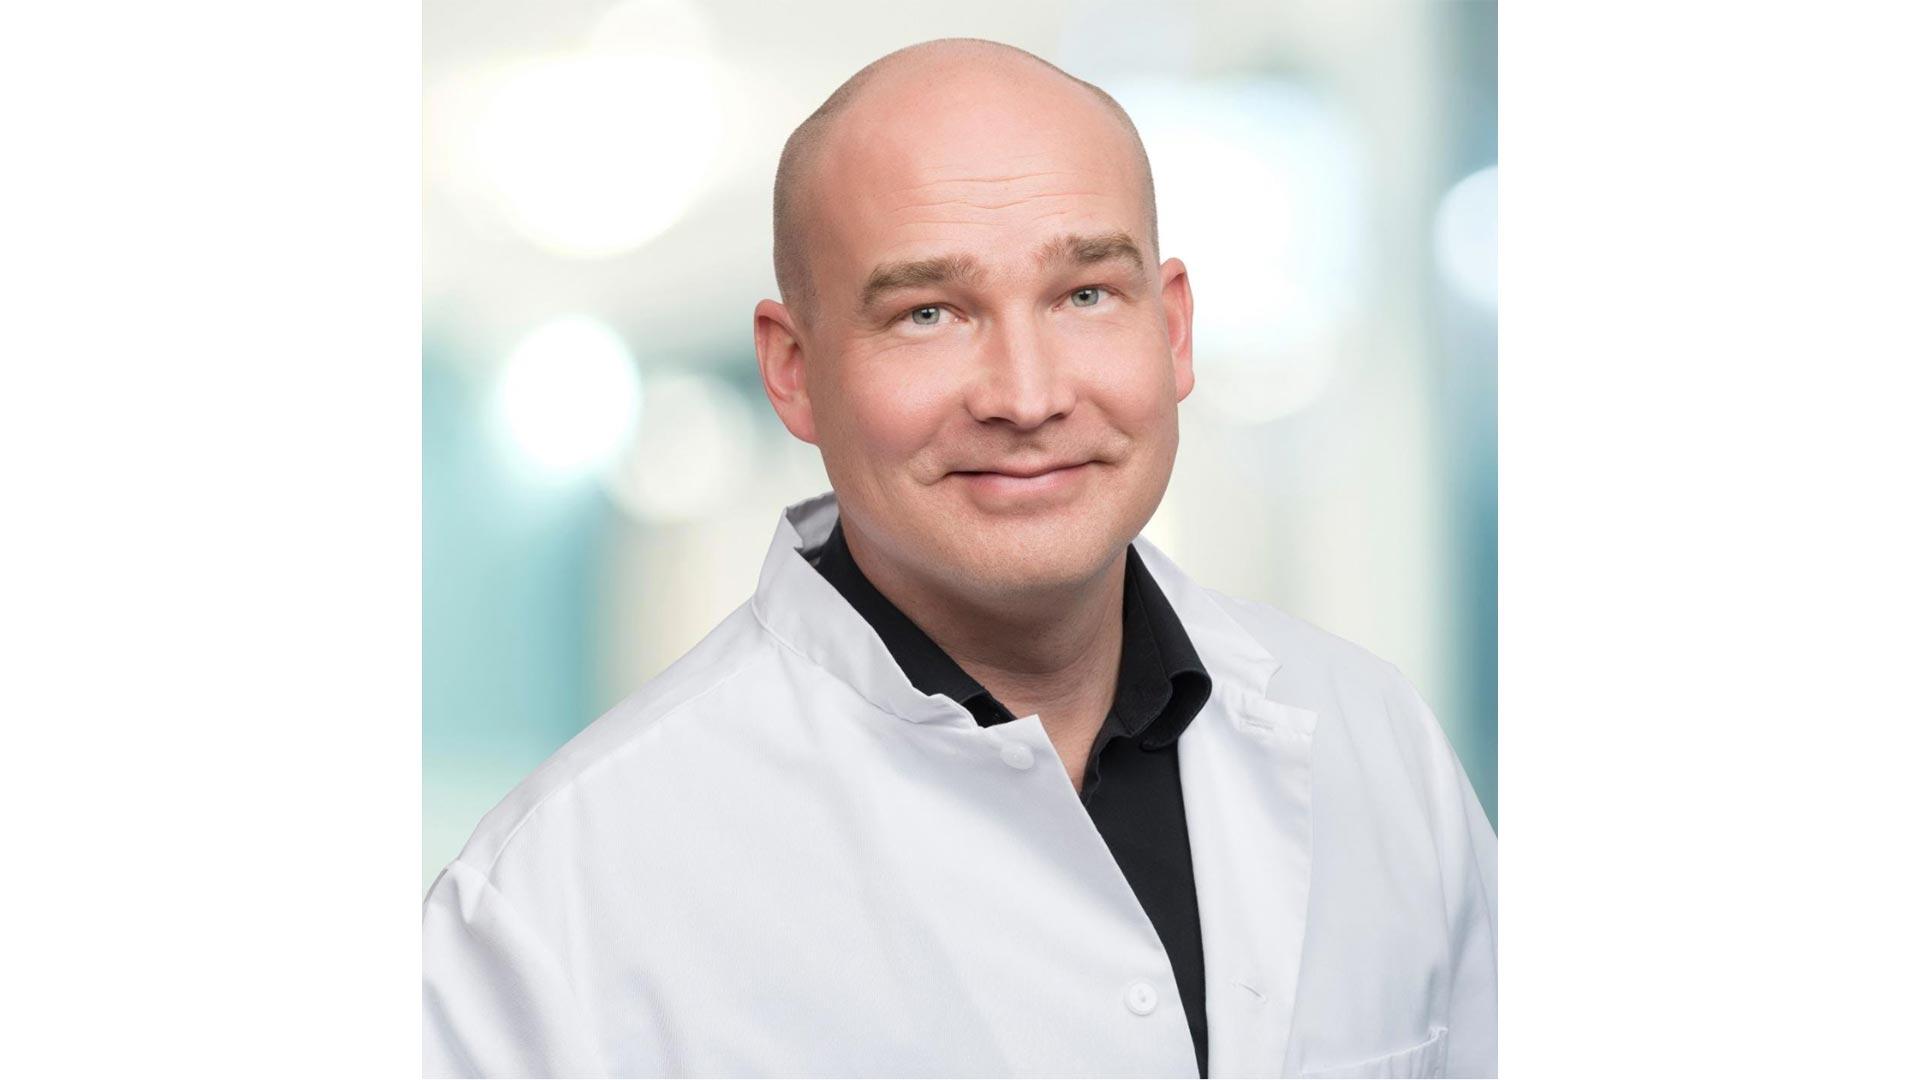 Timo Kiljunen, PhD, Adj. Prof., Hospital Physicist at Docrates same day treatment